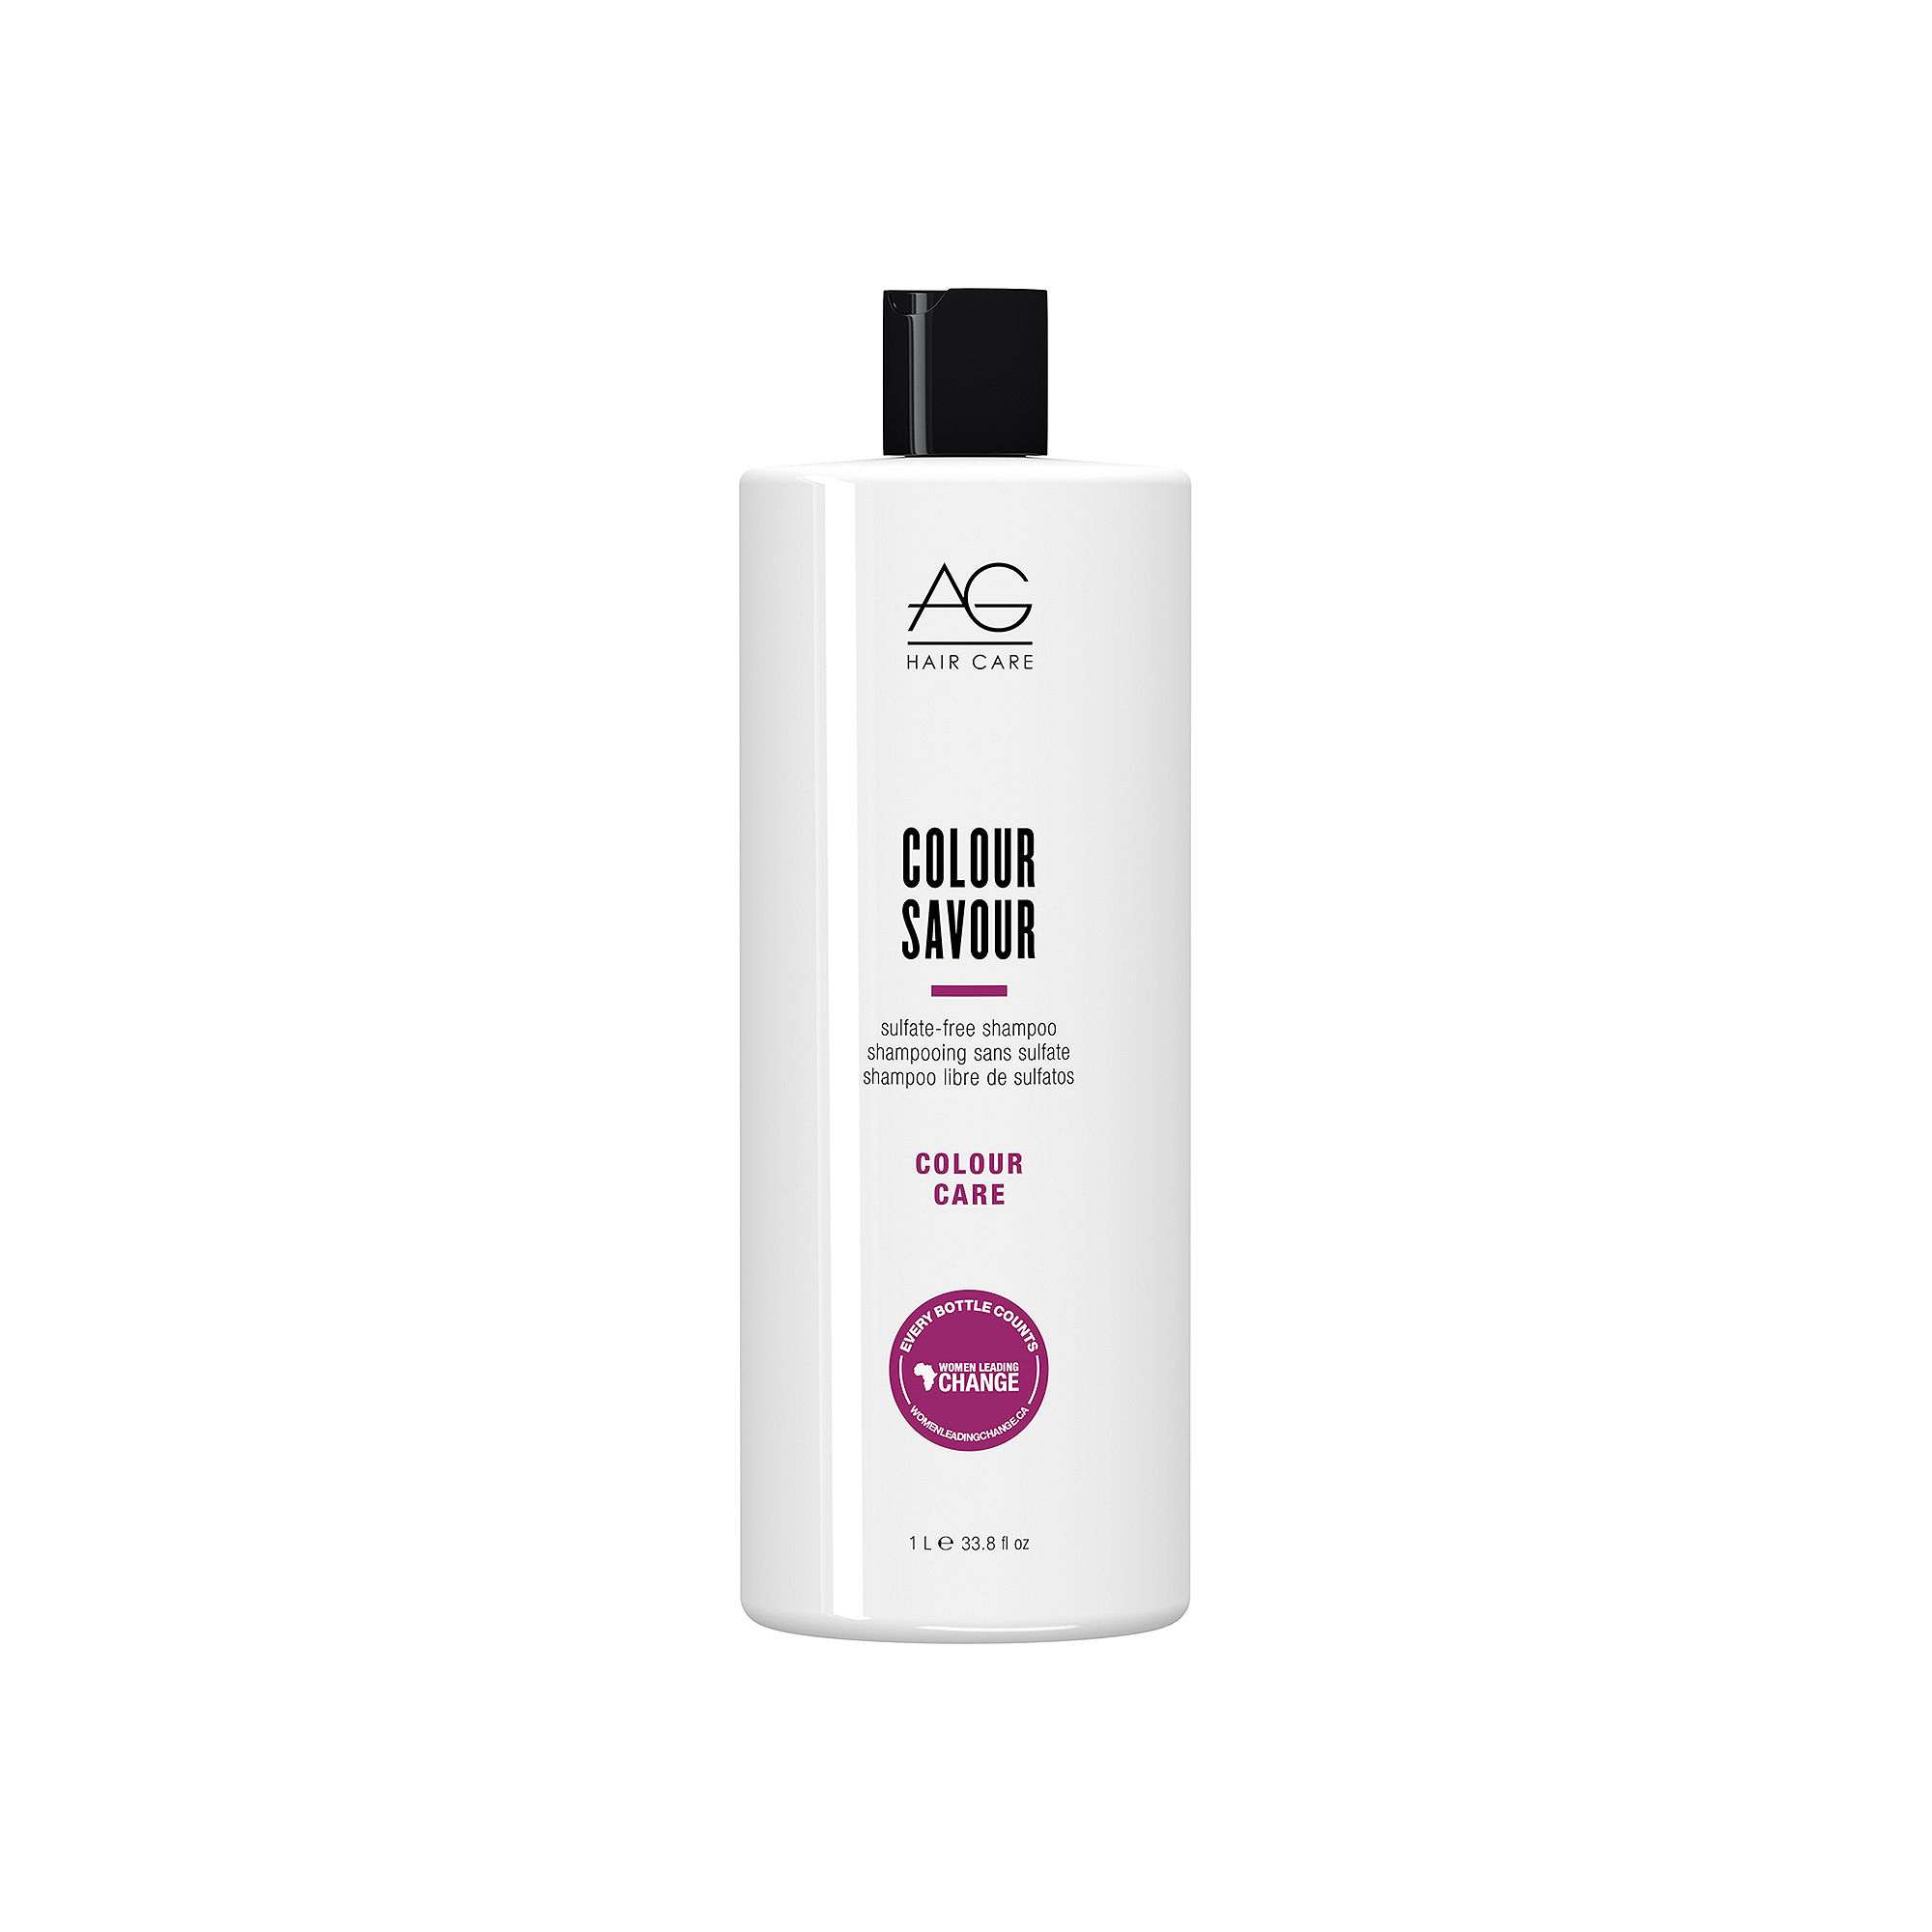 AG Hair Colour Savour Shampoo - 33.8 oz.